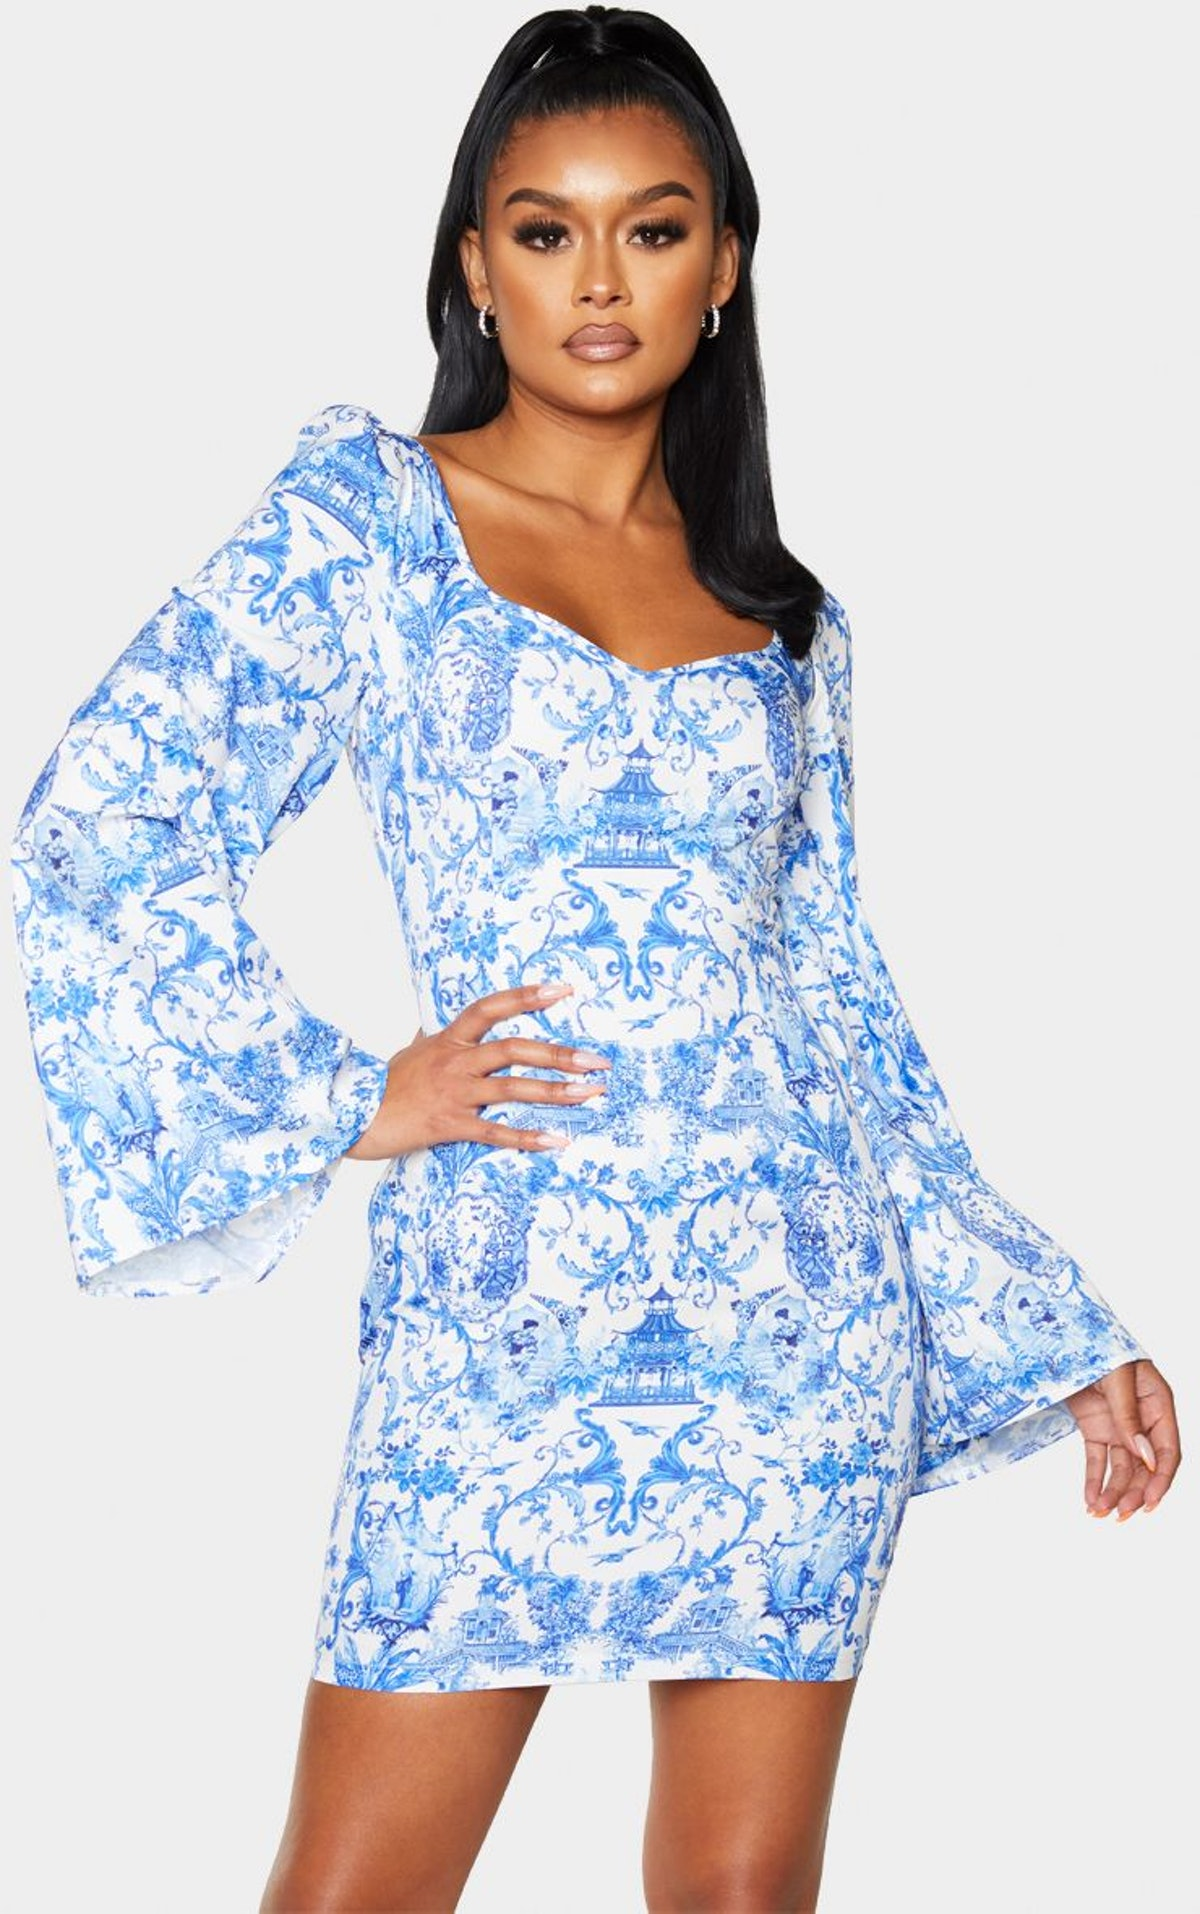 PrettyLittleThing Blue Porcelain Print Satin Lace Up Back Bodycon Dress